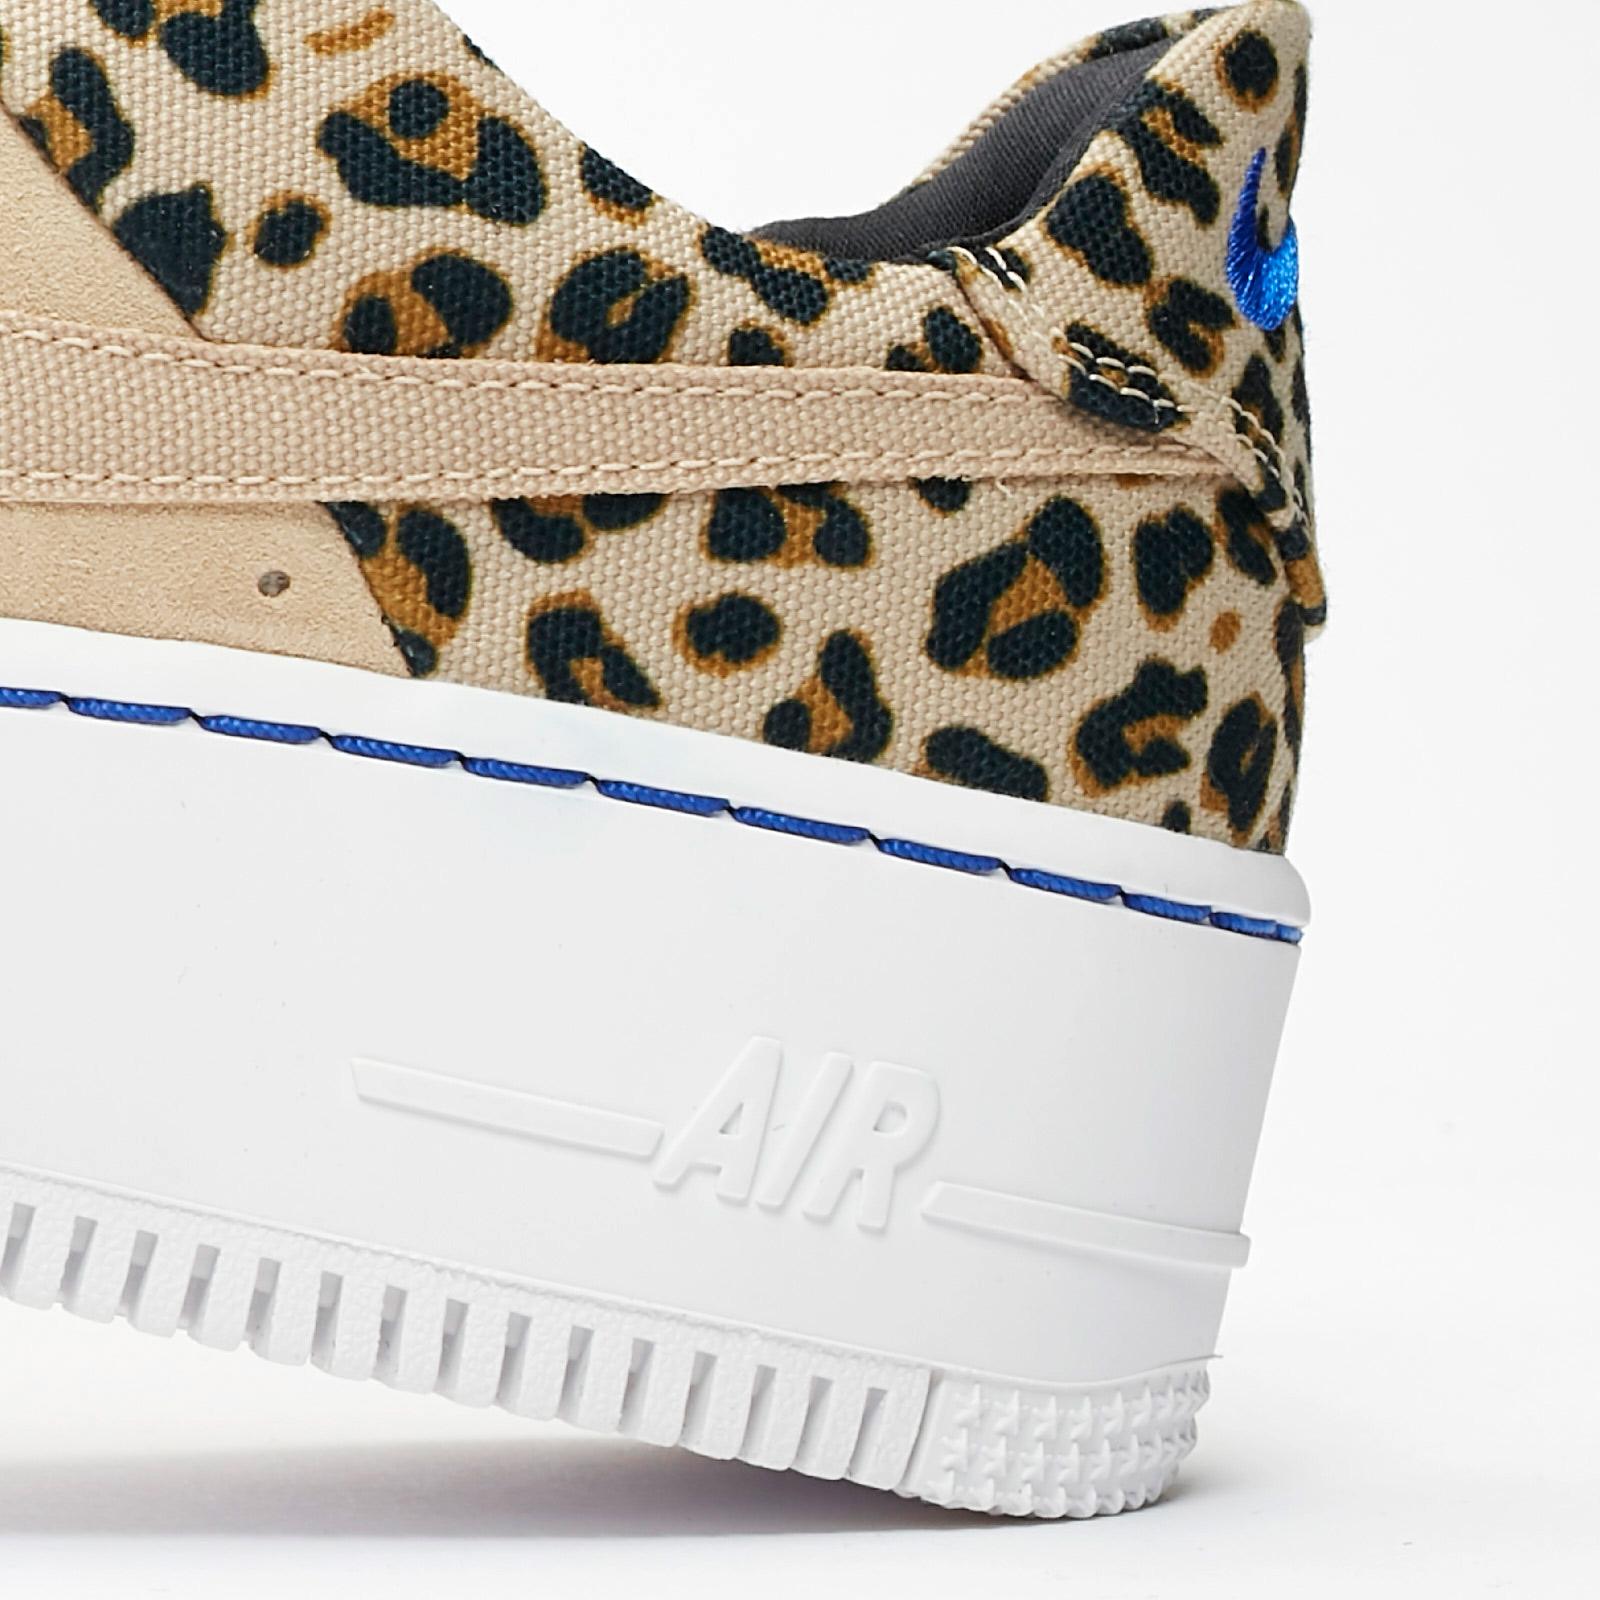 f9108b82f3c1 Nike Wmns Air Force 1 Sage Lo Premium - Bv1979-200 - Sneakersnstuff ...